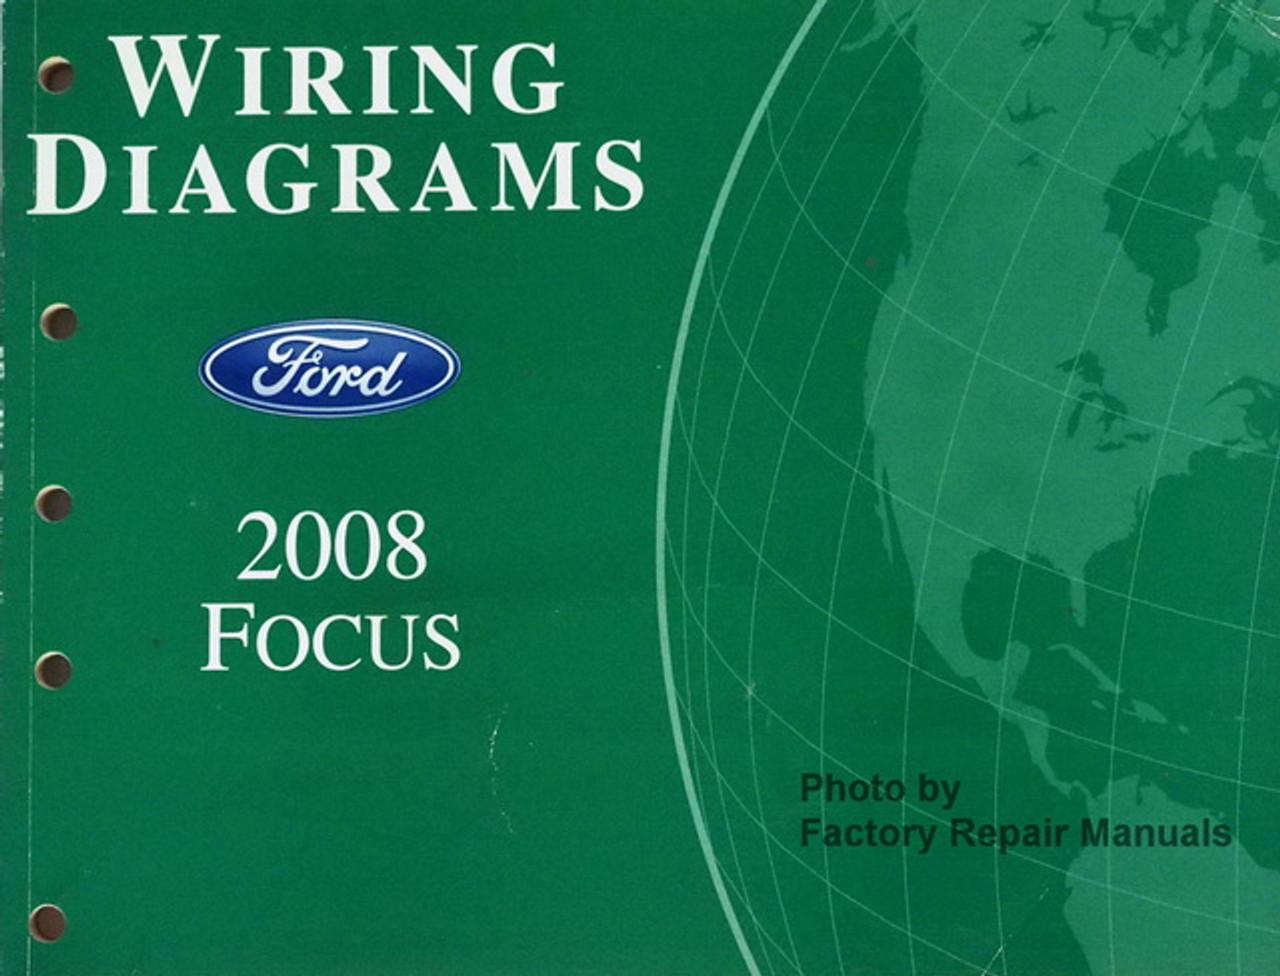 2008 ford focus electrical wiring diagrams original factory manual -  factory repair manuals  factory repair manuals